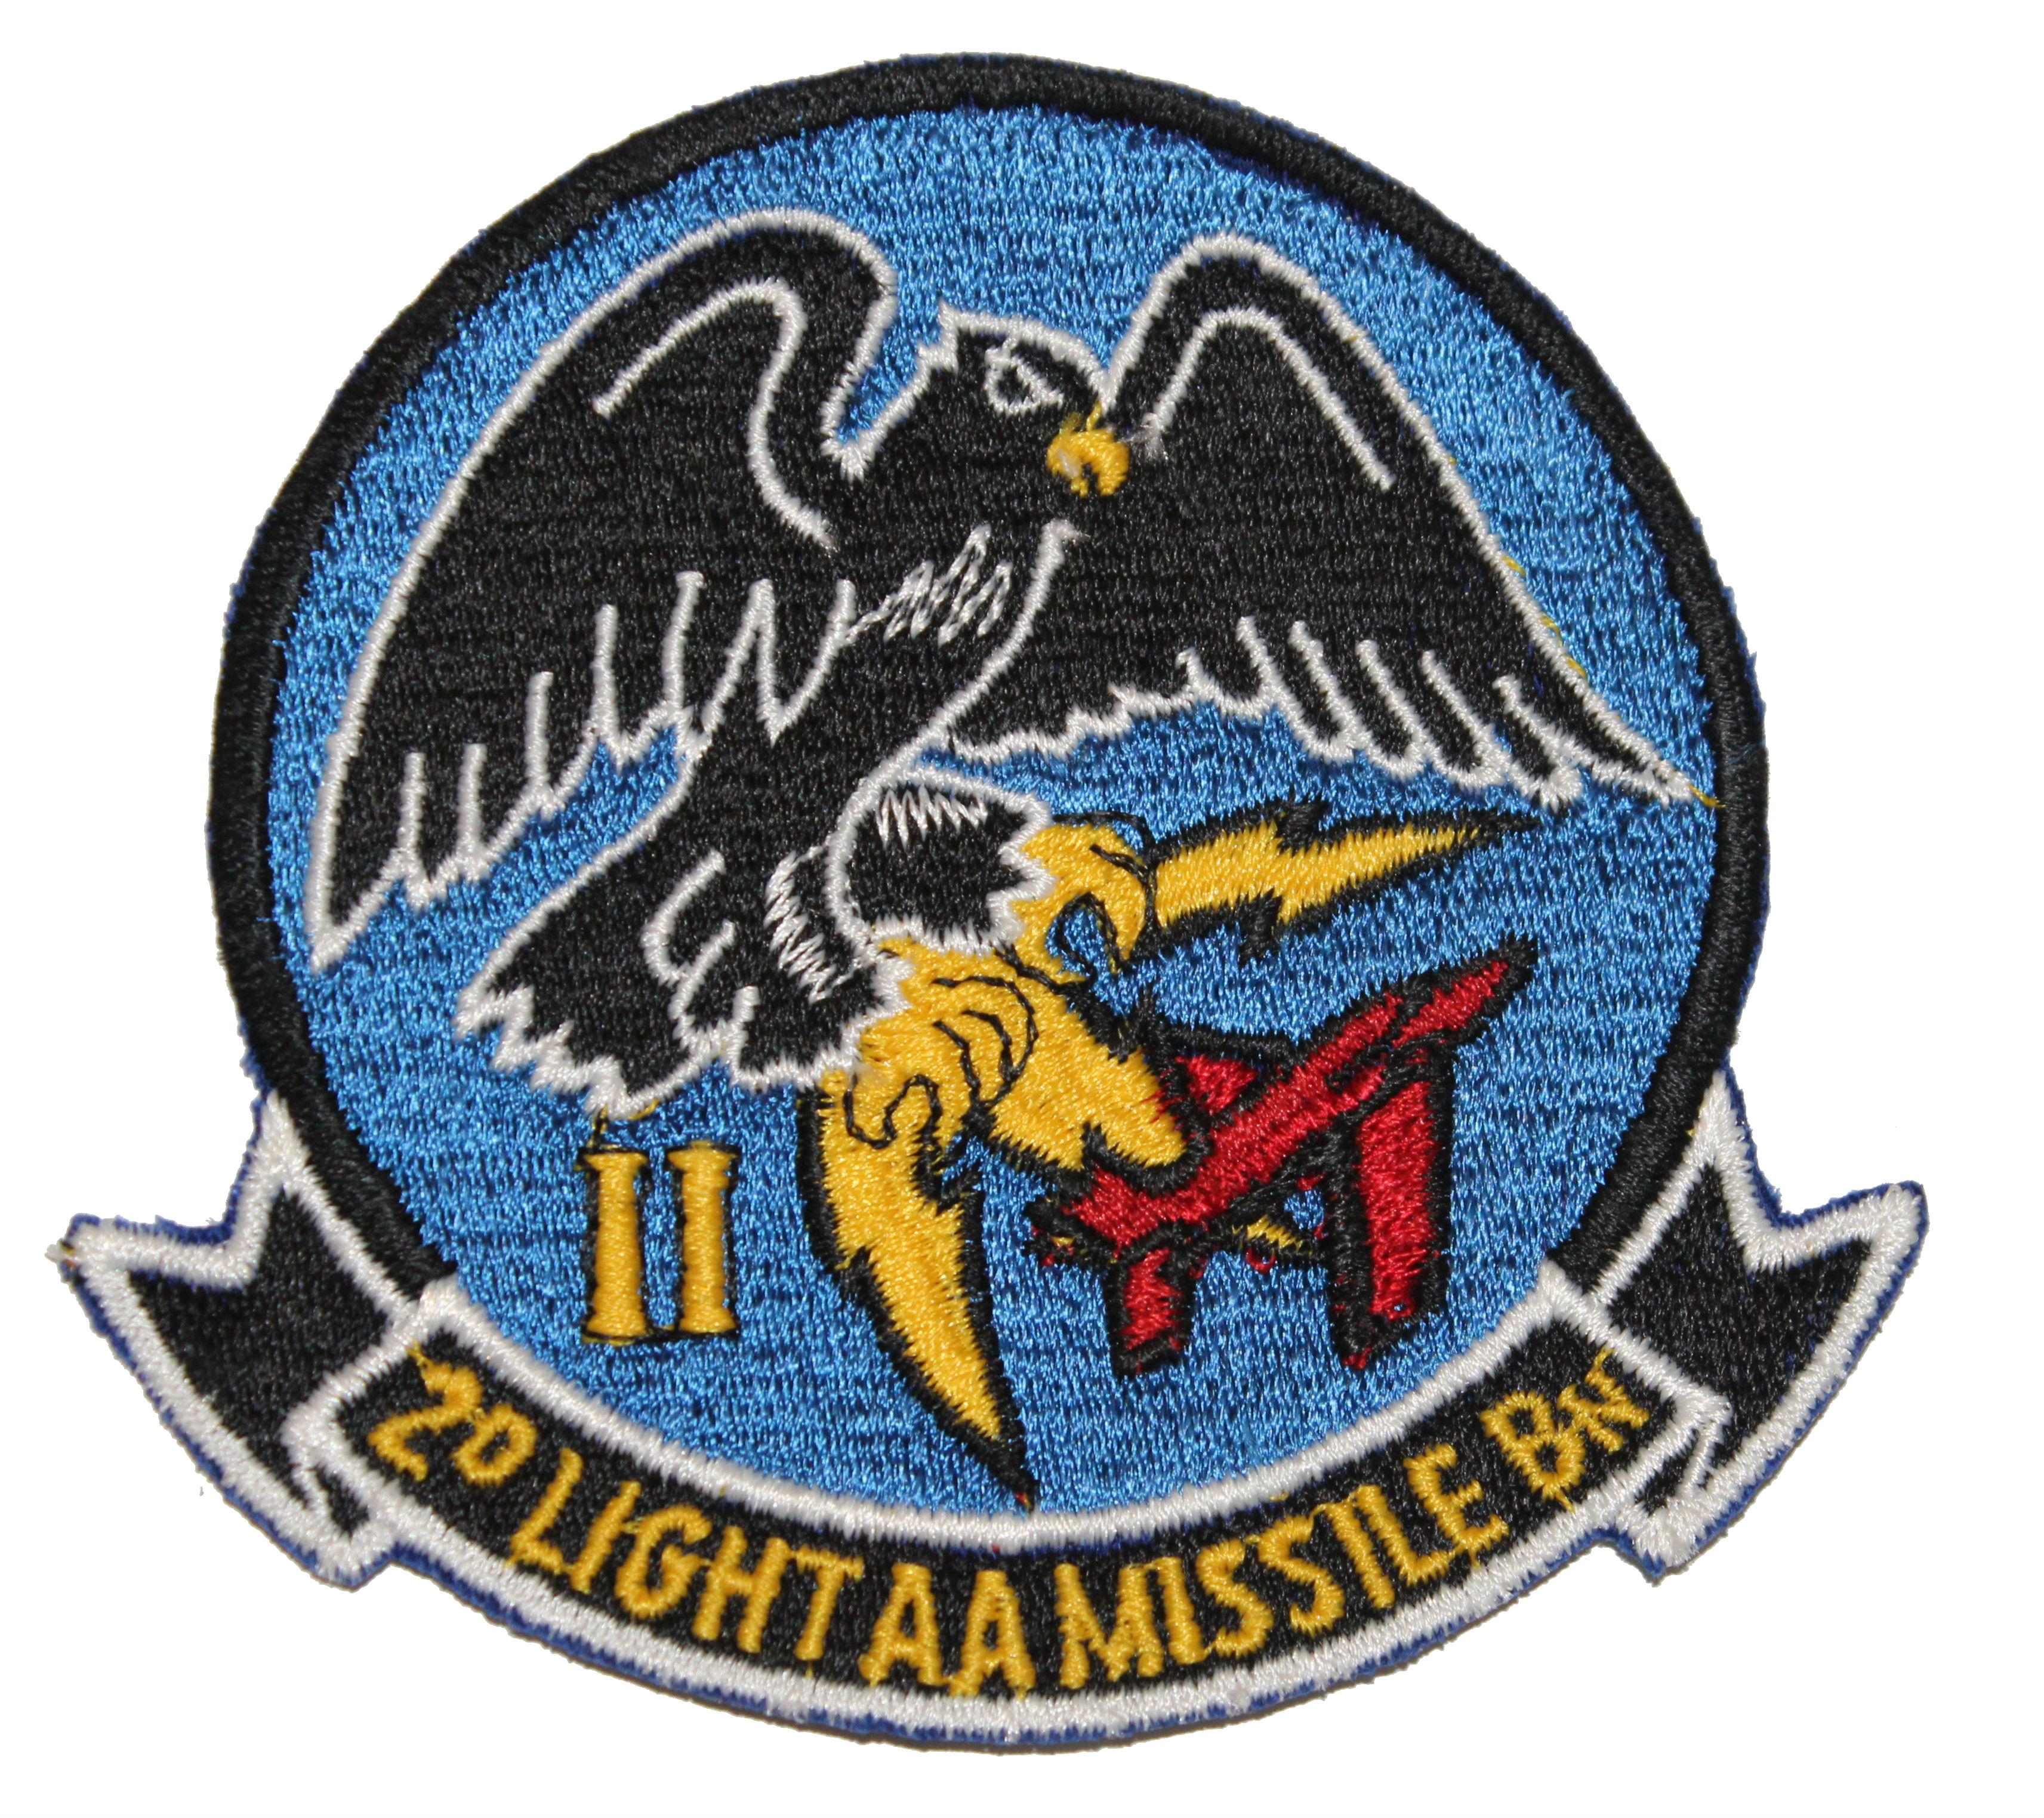 USMC 2d LAAM Bn PATCH Marines 2nd Light Anti-Aircraft Missile Battalion HAWK !